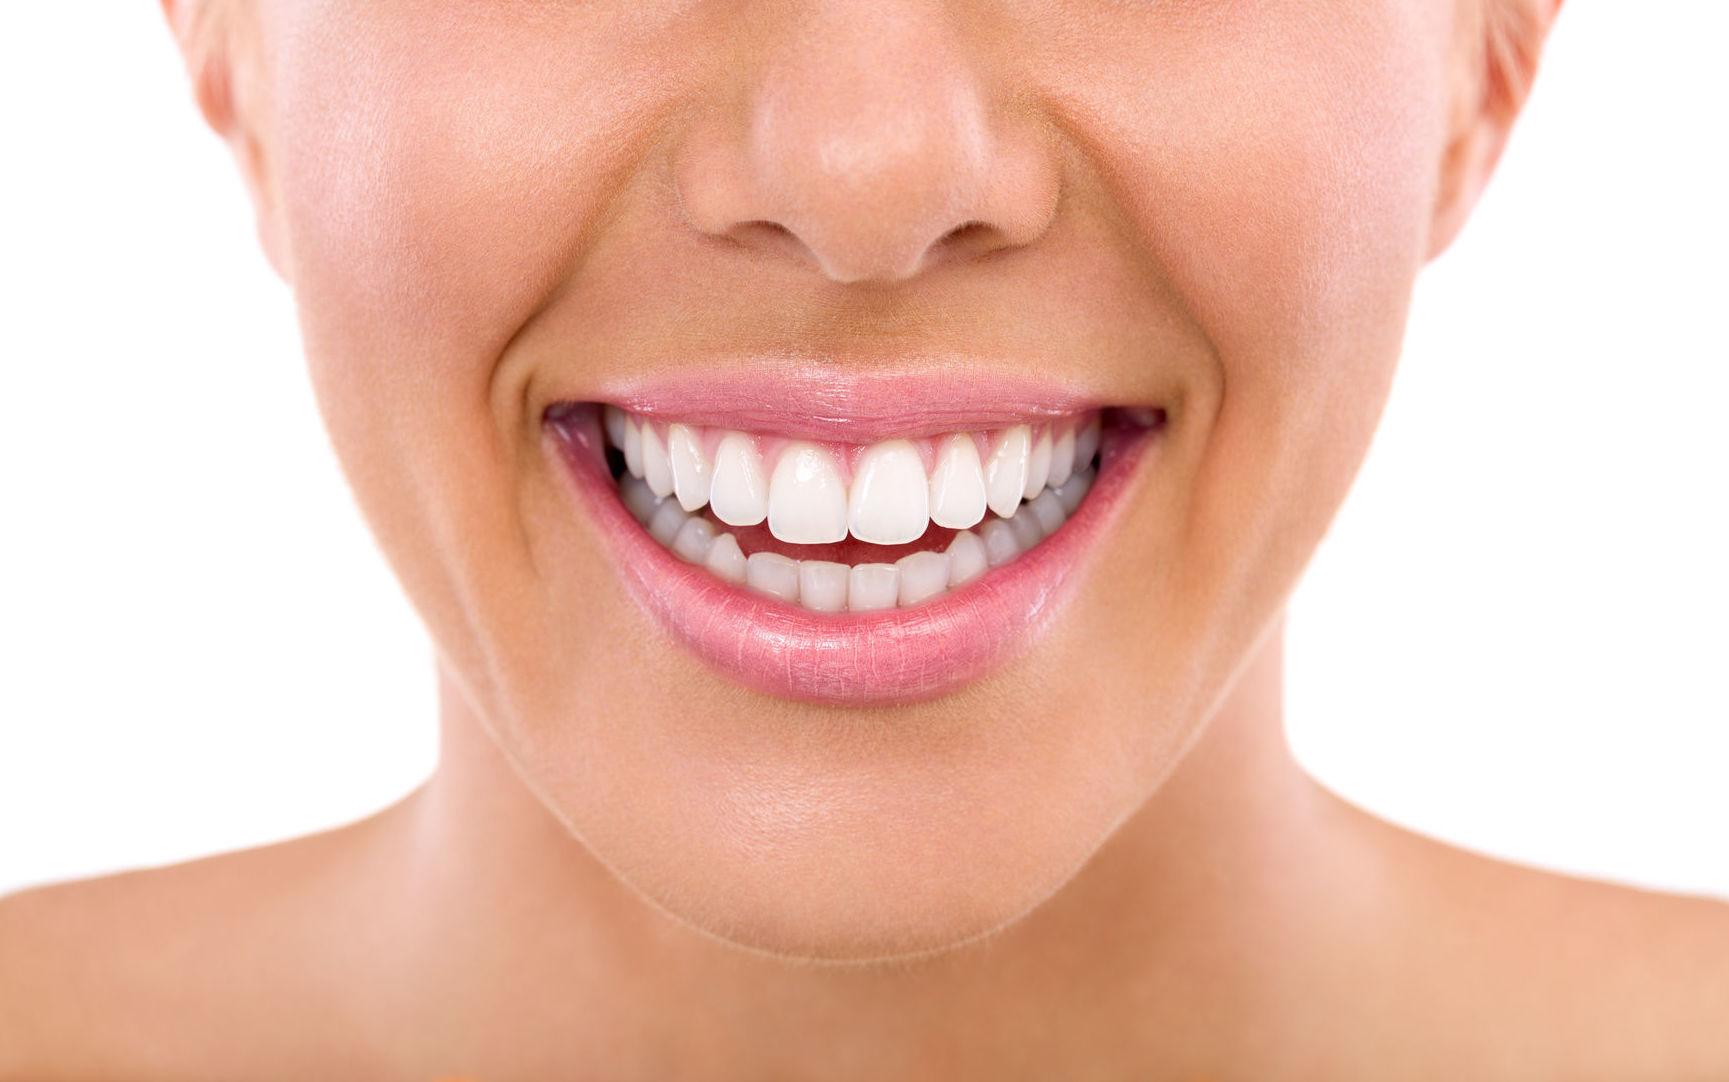 Foto 12 de Clínica dental en Vilanova i la Geltrú | Clínica Dental Sant Jordi